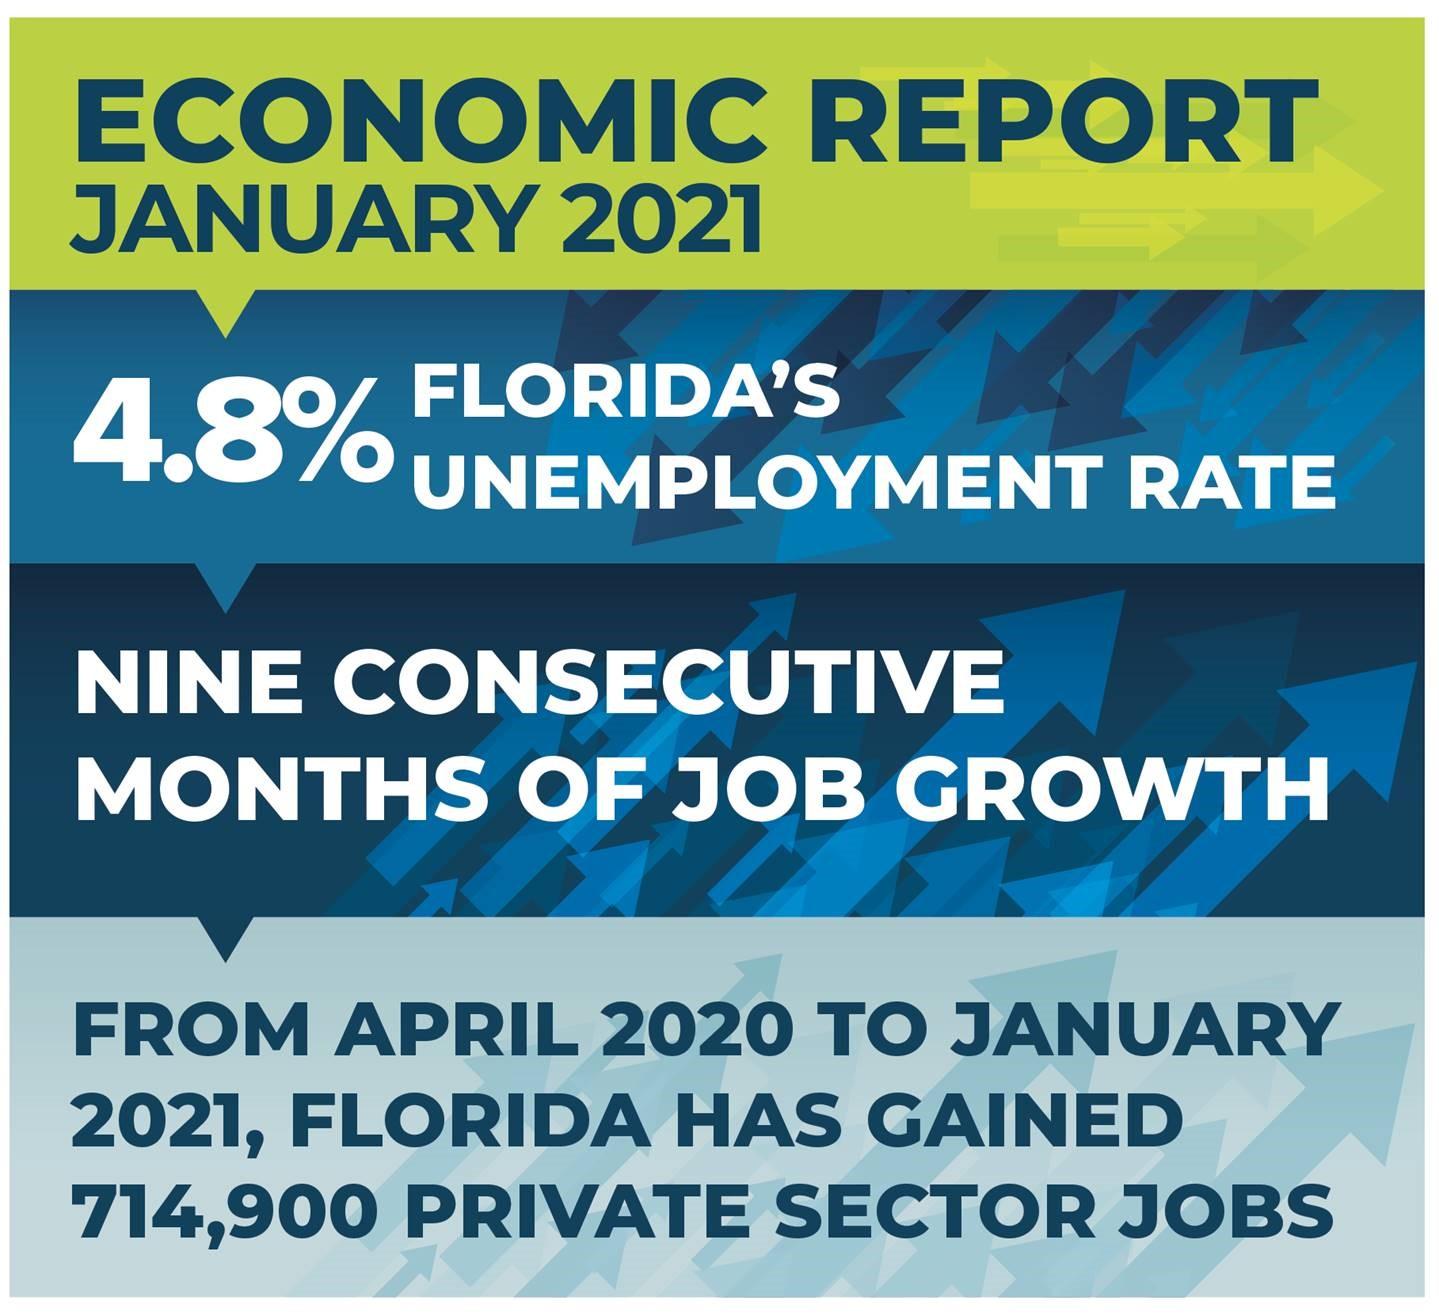 desantisunemployment.jpg